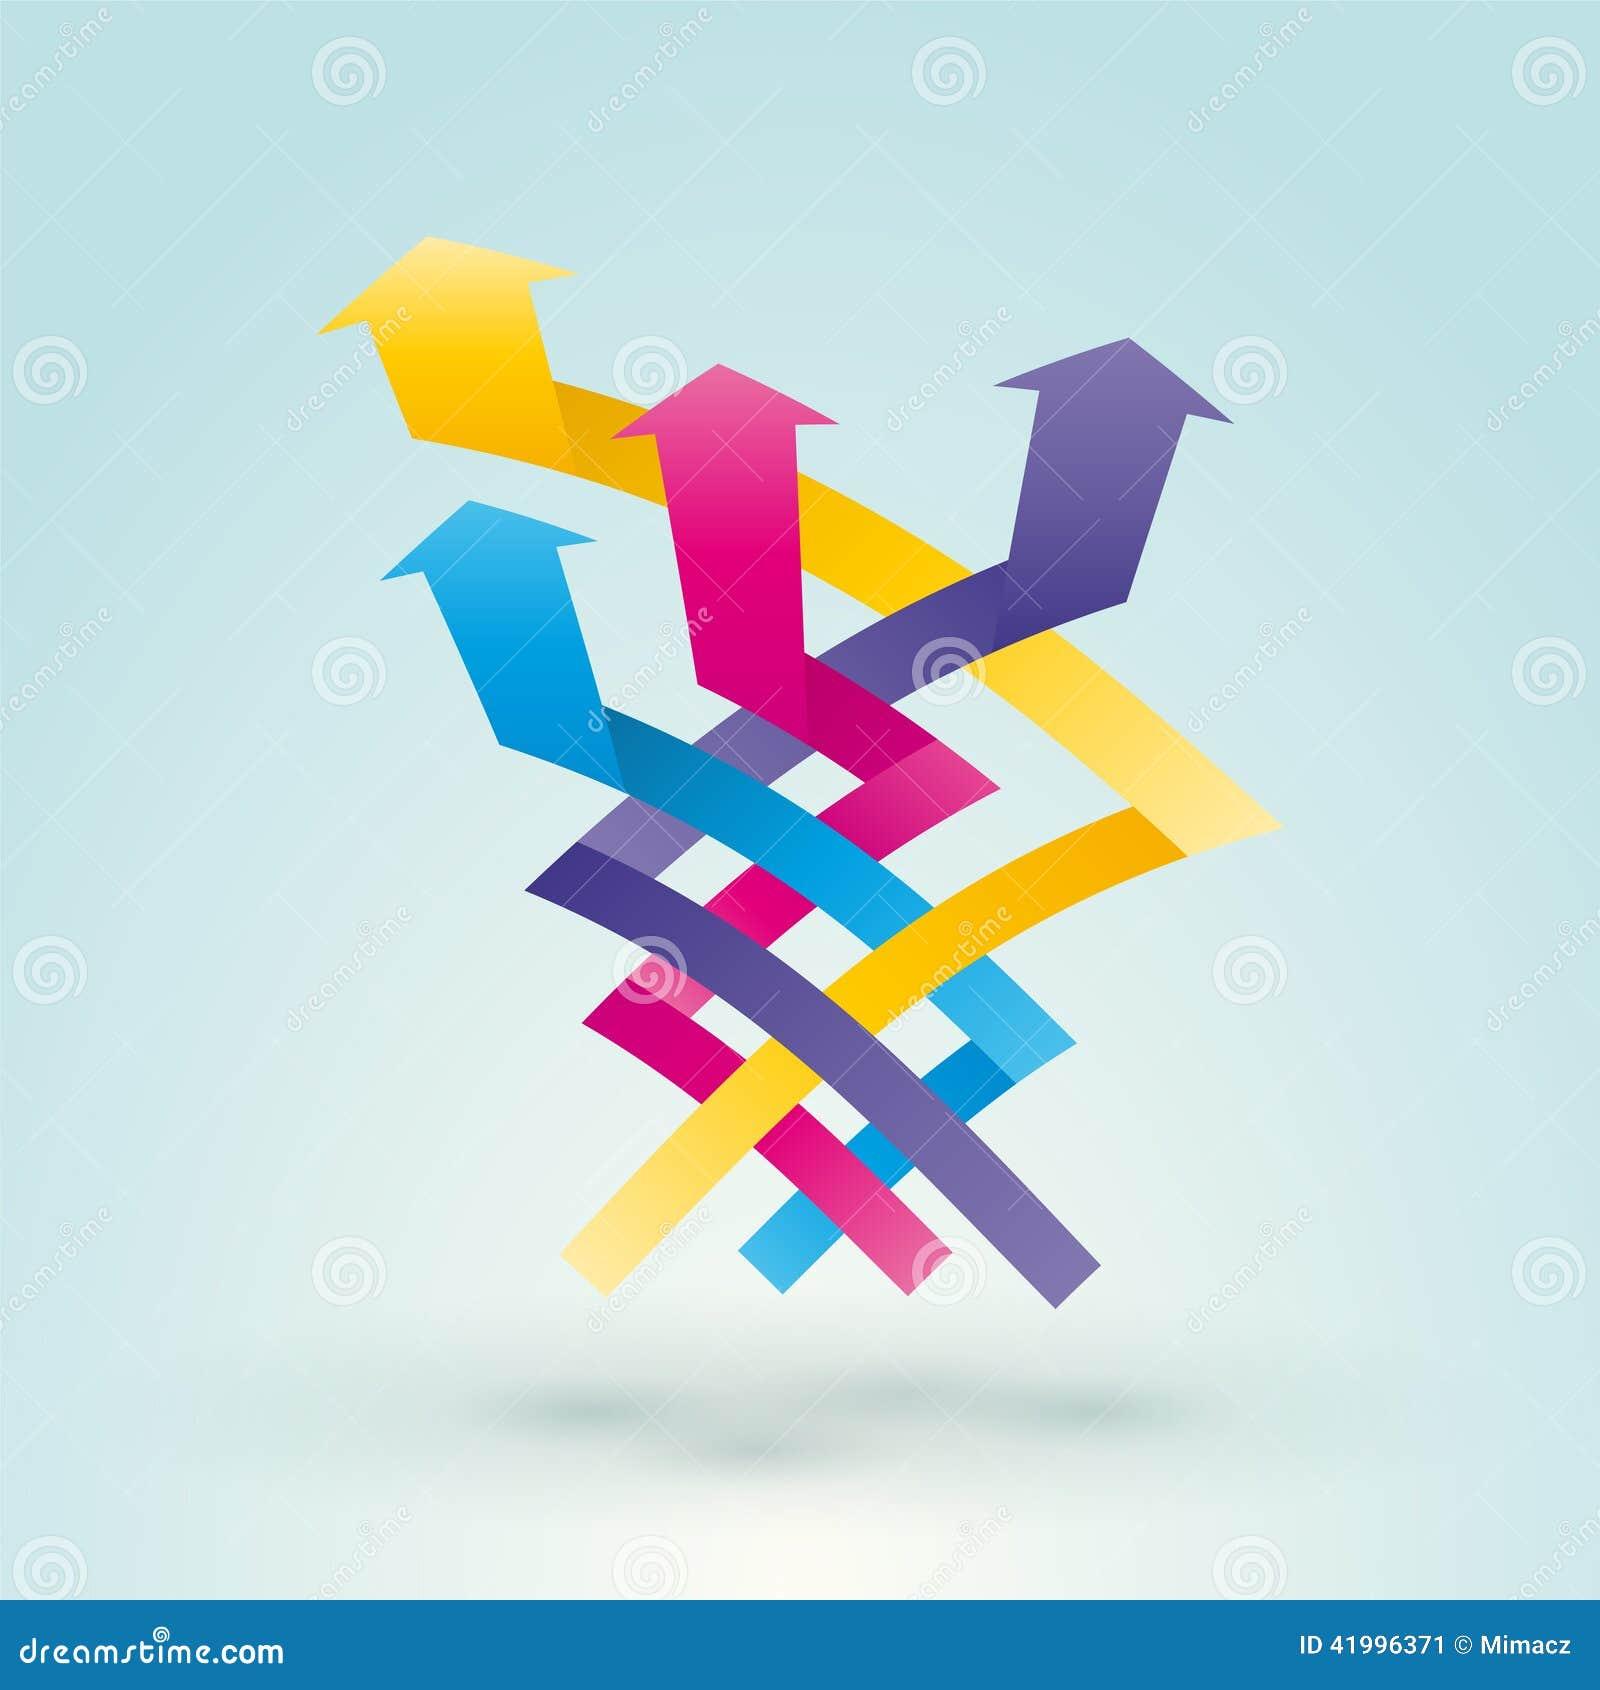 Intertwined arrow